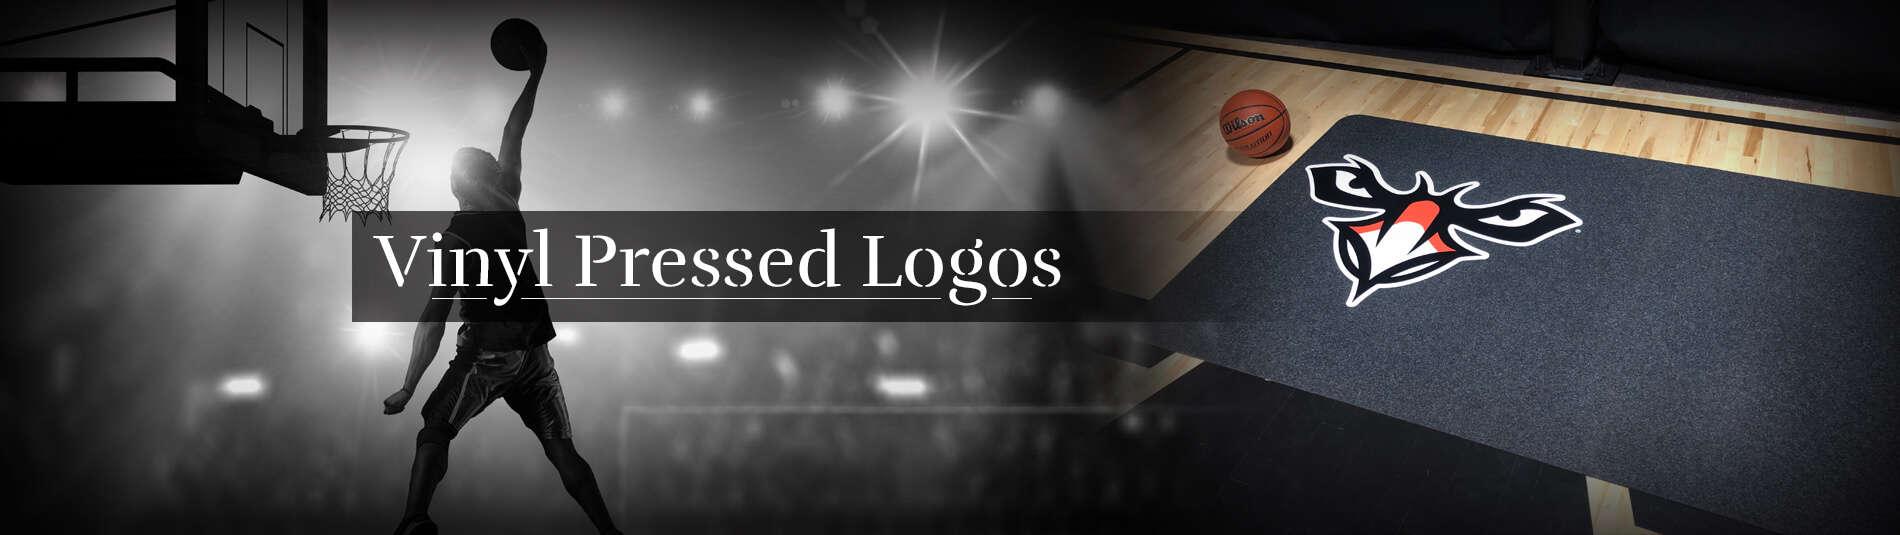 5 Vinyl Pressed Logos